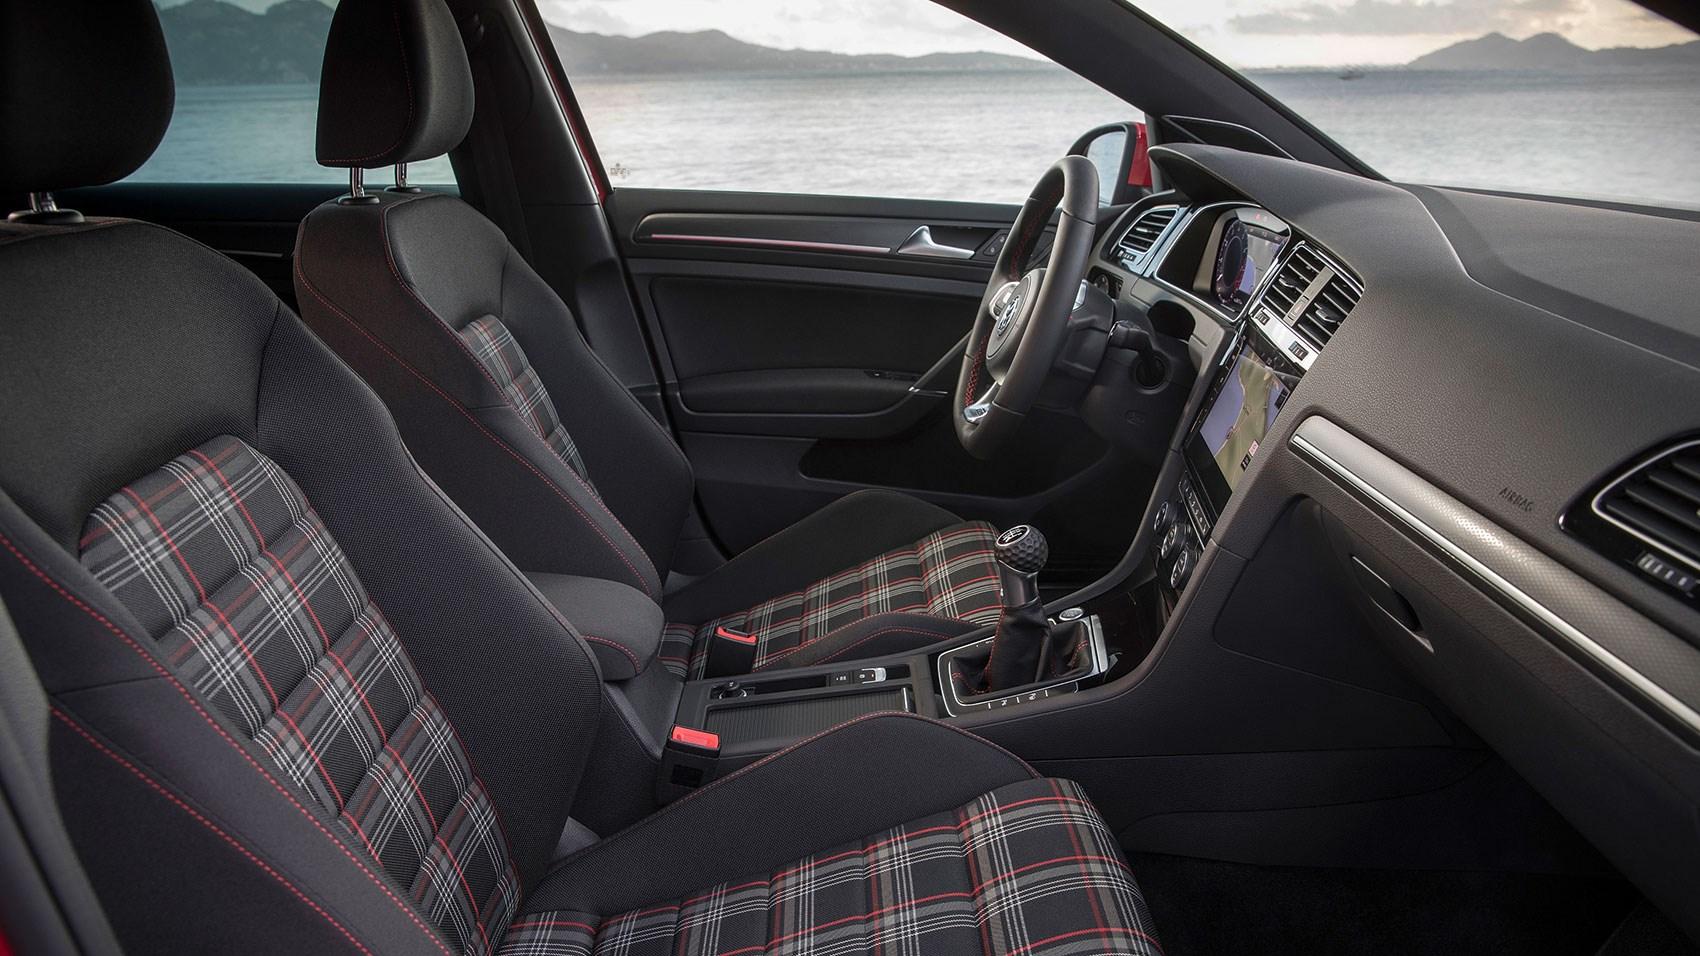 VW Golf GTI 2017 cabin with tartan seats